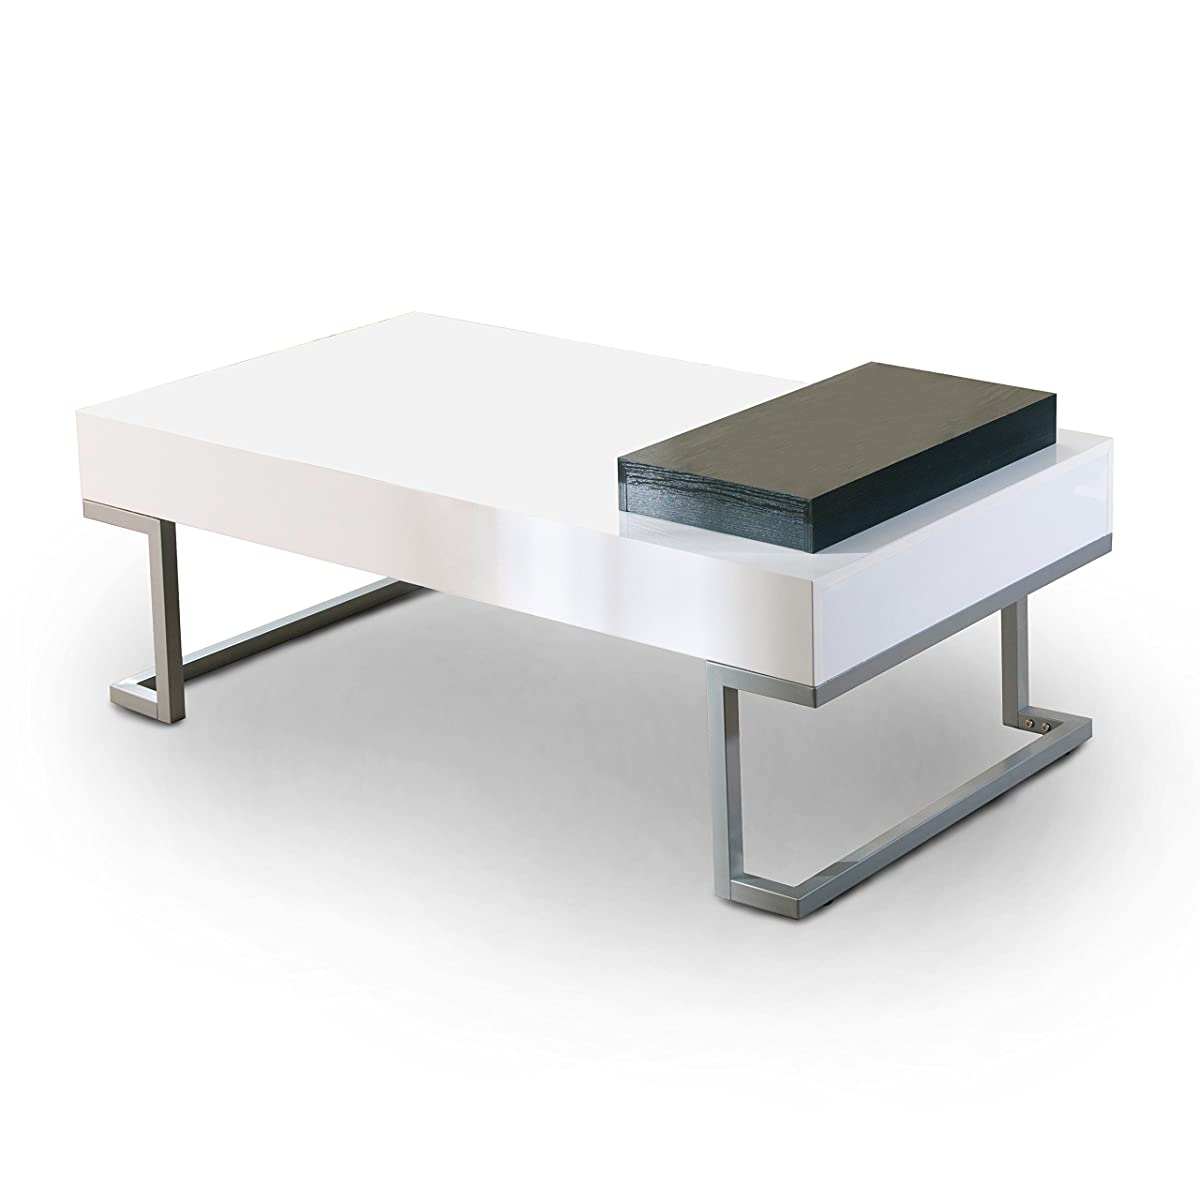 ioHOMES Verona Rectangular Coffee Table and Serving Block, Glossy White